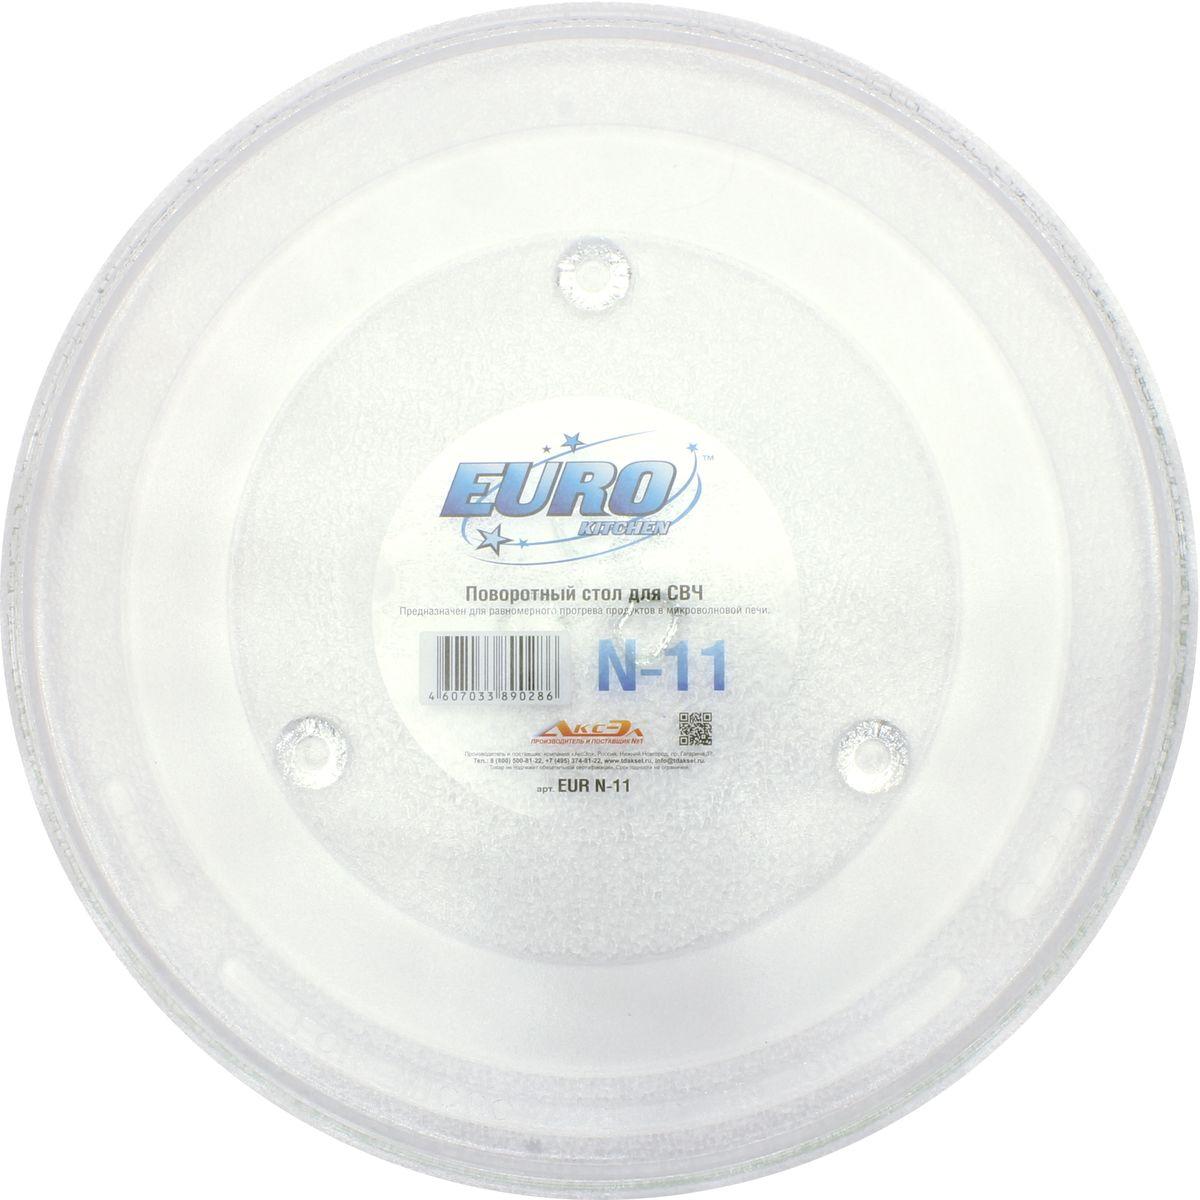 Euro Kitchen N-11 тарелка для СВЧN-11Универсальная тарелка N-11 для микроволновой печи с куплером. Диаметр тарелки 295 мм. Изготовлена из специального жаропрочного стекла. Предназначена для равномерного разогрева продуктов в микроволновой печи.Подходит для брендов:Aeg, Airhot, Amica, Ardo, Ariston, Asko, Atlanta, Aurora, Ava, Barazza, Bauknecht, Bbk, Beko, Bomann, Bork, Bosch, Brandt, Candy, Cata, Centek, Clatronic, Daewoo, De dietrich, Delfa, Electrolux, Elenberg, Ergo, Erisson, Eurotec, Fagor, Fimar, Foster, Franke, Fulgor, Fusion, Gaggenau, Gastrorag, Goldstar, Gorenje, Hankel, Hansa, Hilton, Horizont, Hurakan, Hyundai, Ilve, Indesit, Kaiser, Kenmore, Kenwood, Korting, Kuppersberg, Kuppersbusch, Kamark, Keran, Lg, Liberton, Liberty, Maxwell, Menumaster, Midea, Miele, Moulinex, Mystery, Neff, Oursson, Panasonic, Proficook, Rainford, Redmond, Rolsen, Samsung, Saturn, Scarlett, Sencor, Sharp, Siemens, Simfer, Sinbo, Sirman, Smeg, Supra, Teka, Thomson, Toshiba, V-zug, Vasko, Vimar, Vitek, Vr, Weissgauff, West, Whirlpool, Zanussi, Zelmer, Zigmund&Shtain, Витязь, Рубин.